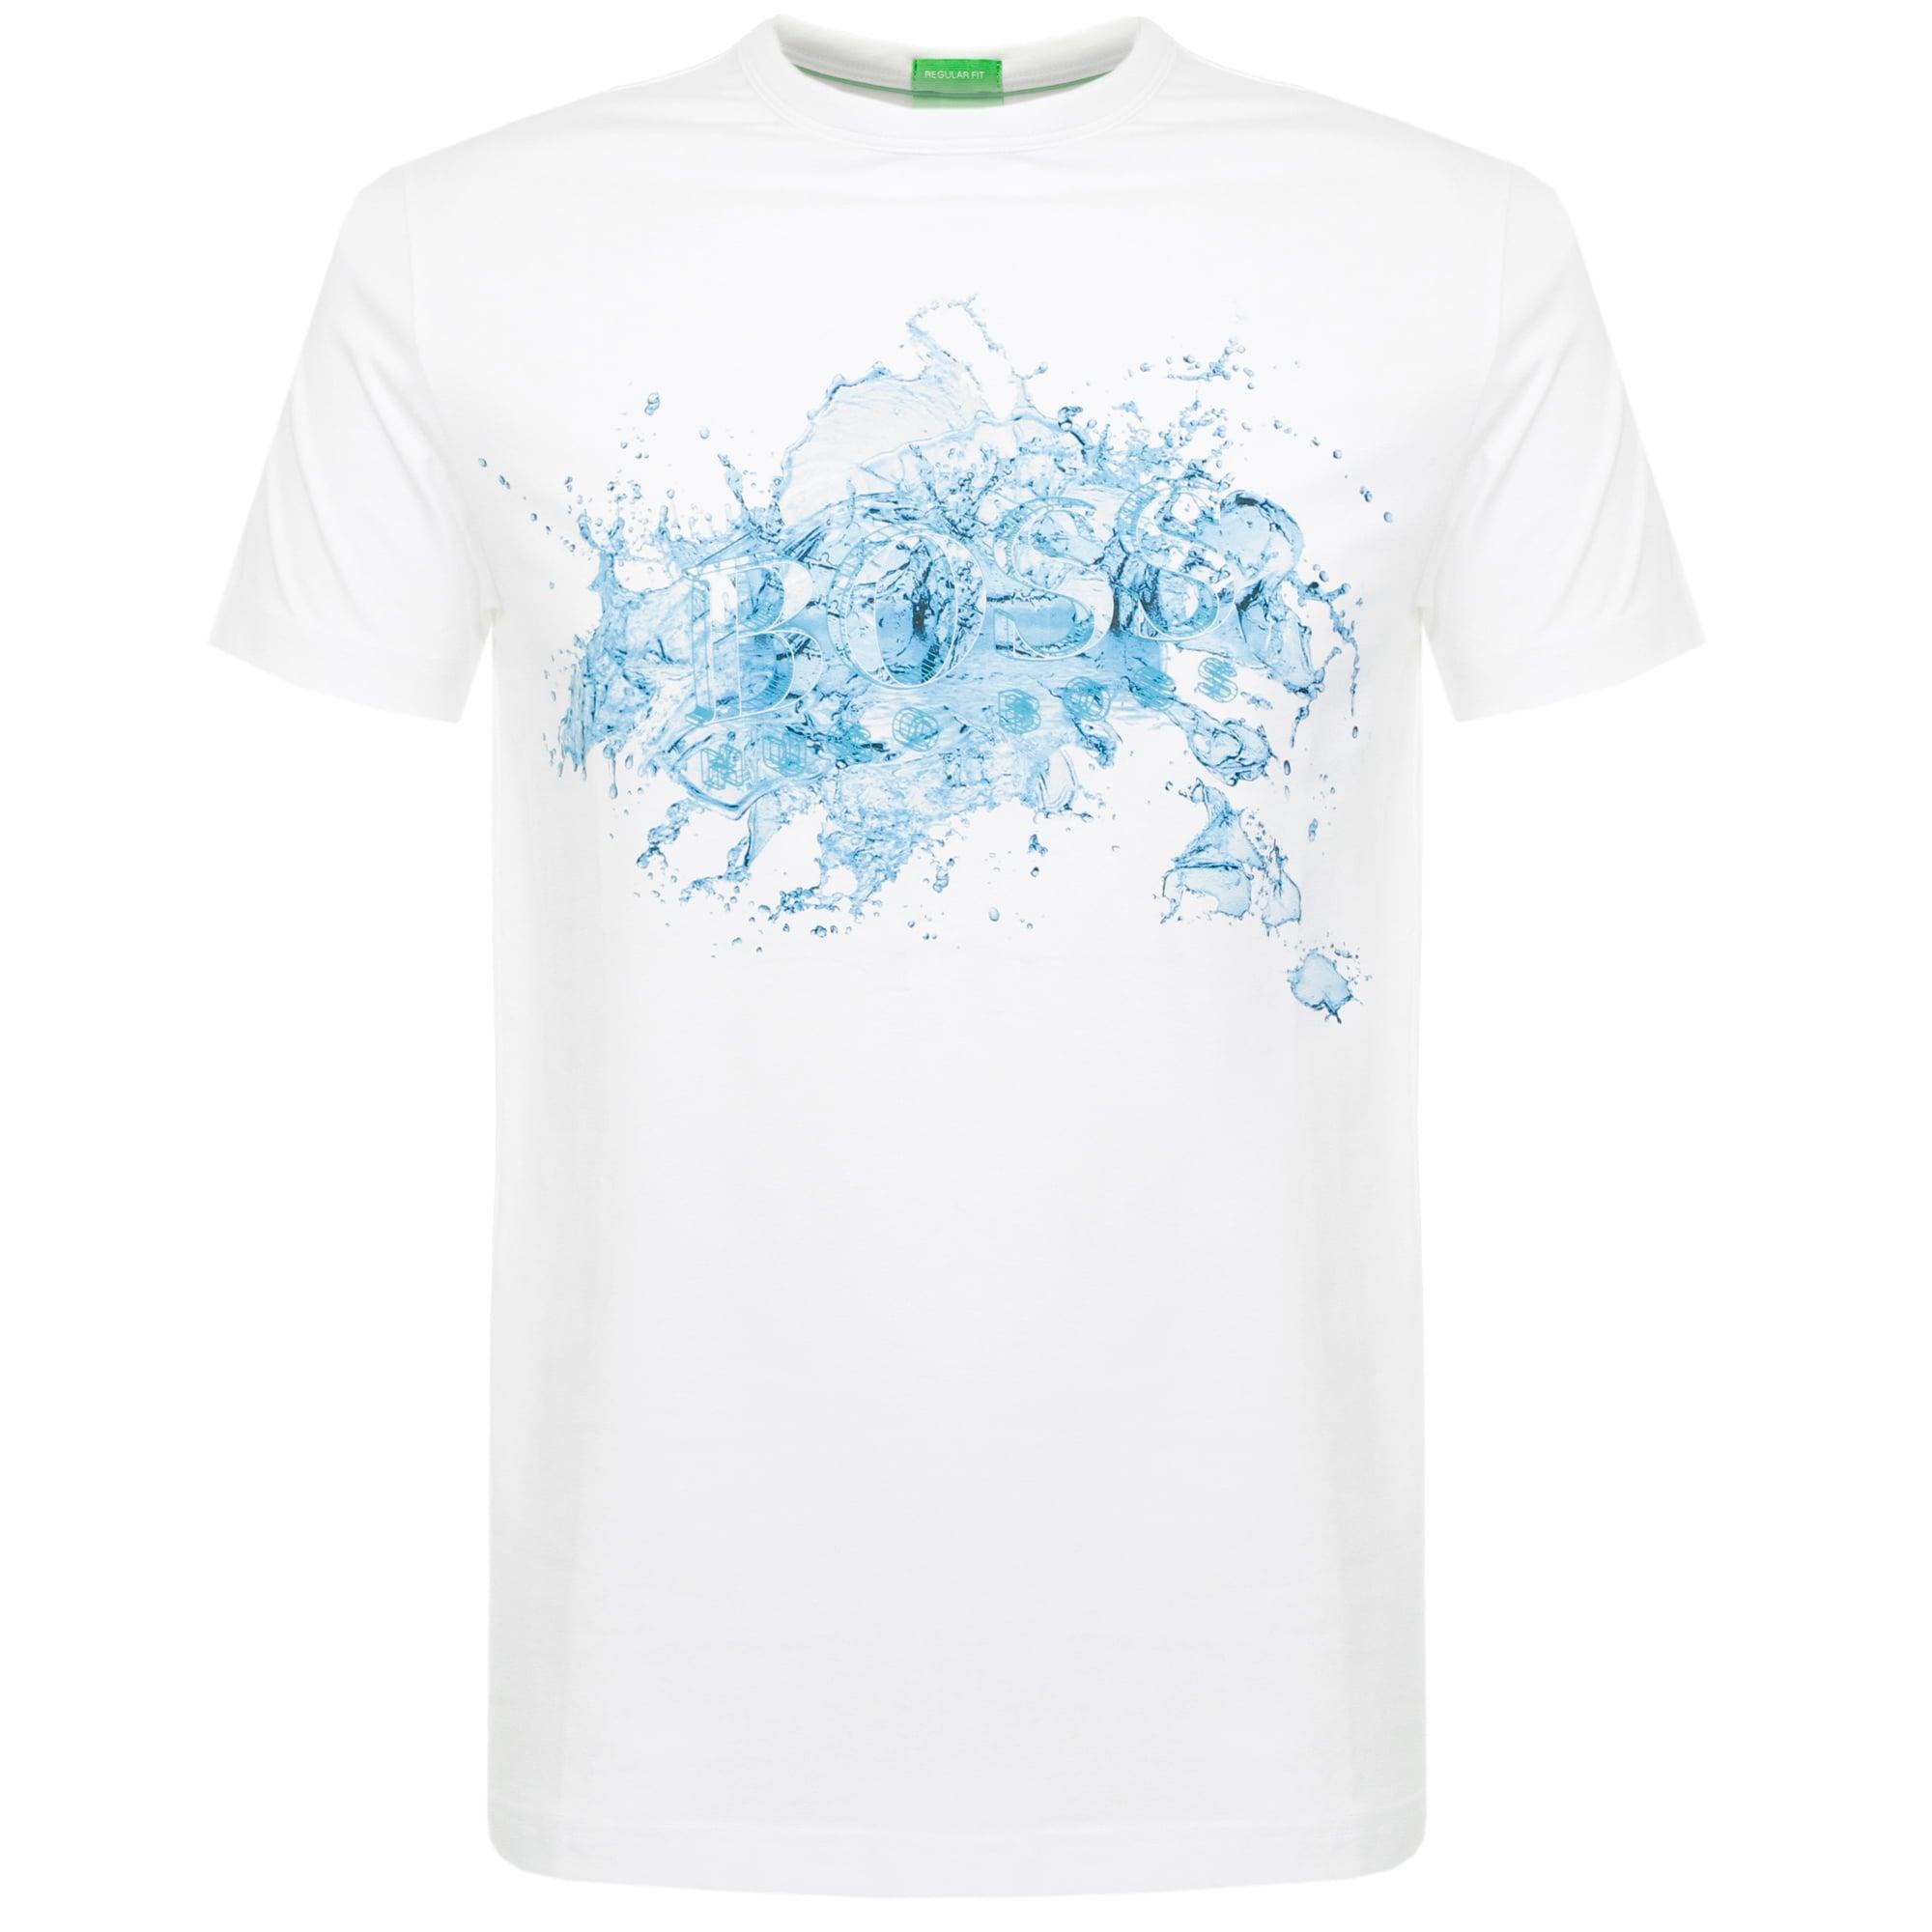 86af1cecf Hugo Boss Tee 8 White T-Shirt 50329420